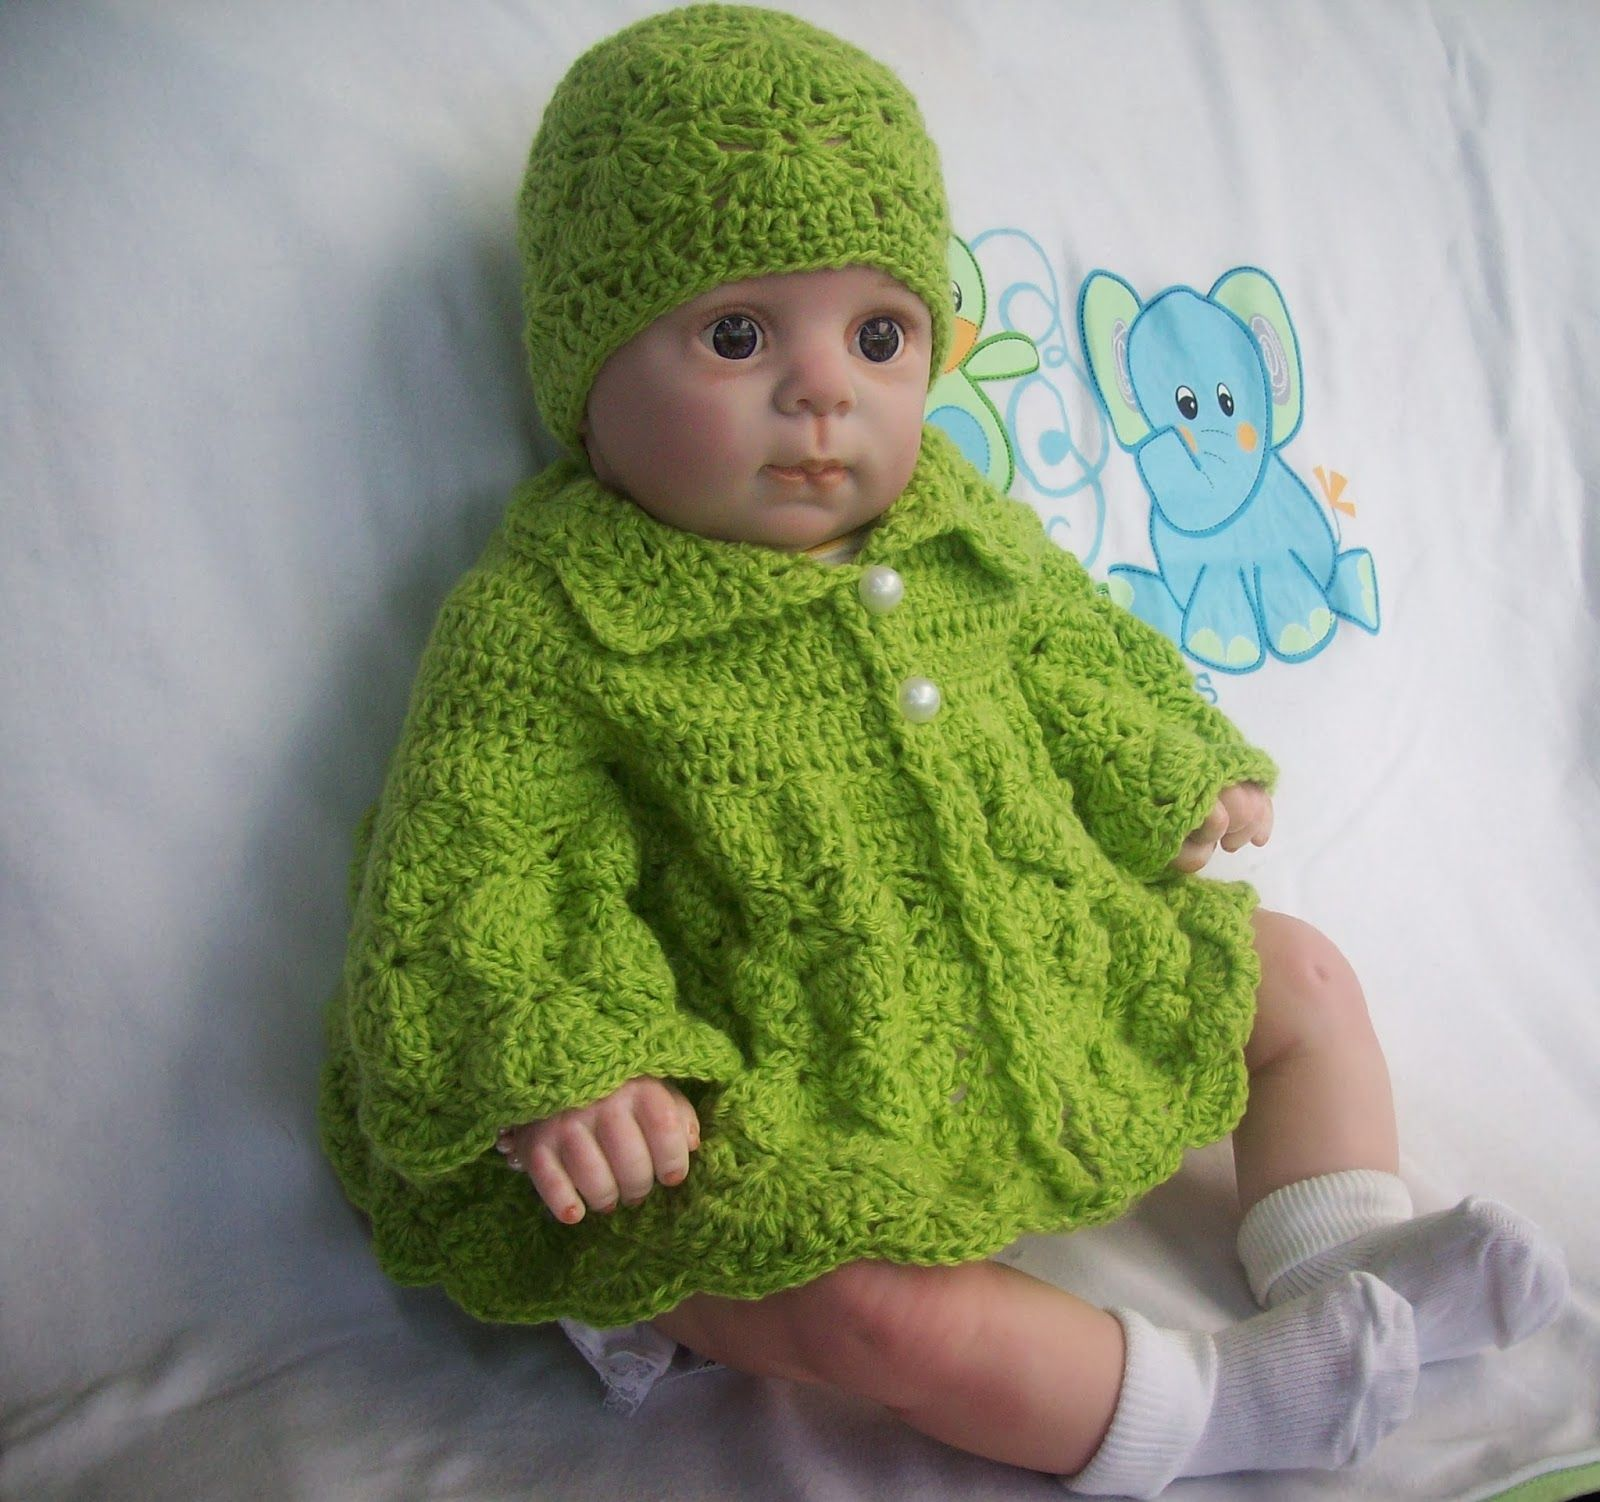 The shy butterfly baby bootie pattern crochet patterns baby the shy butterfly baby bootie pattern free baby crochet bankloansurffo Choice Image